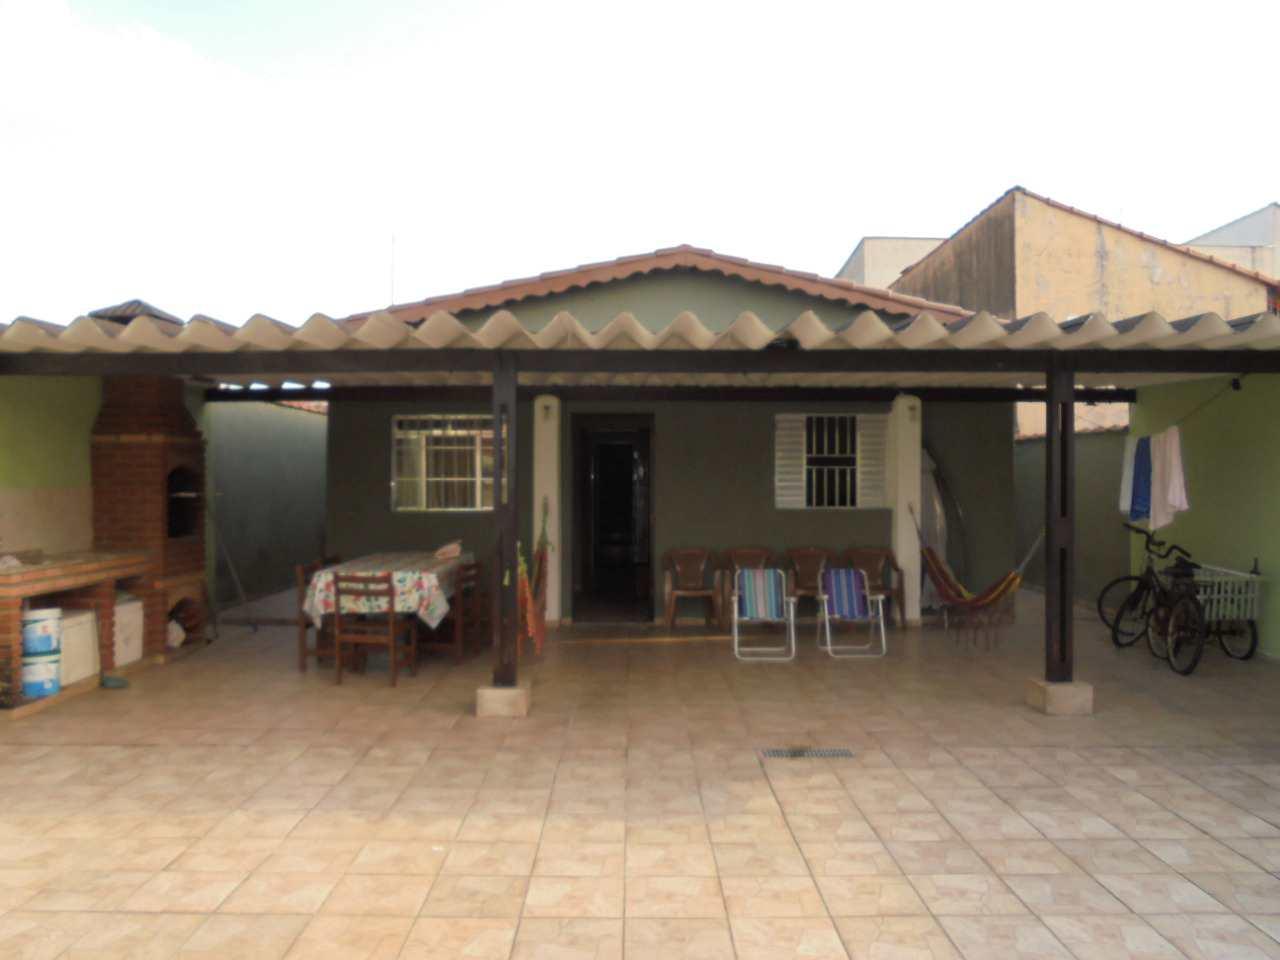 Casa com 3 dorms, Jardim Praia Grande, Mongaguá - R$ 400 mil, Cod: 279388